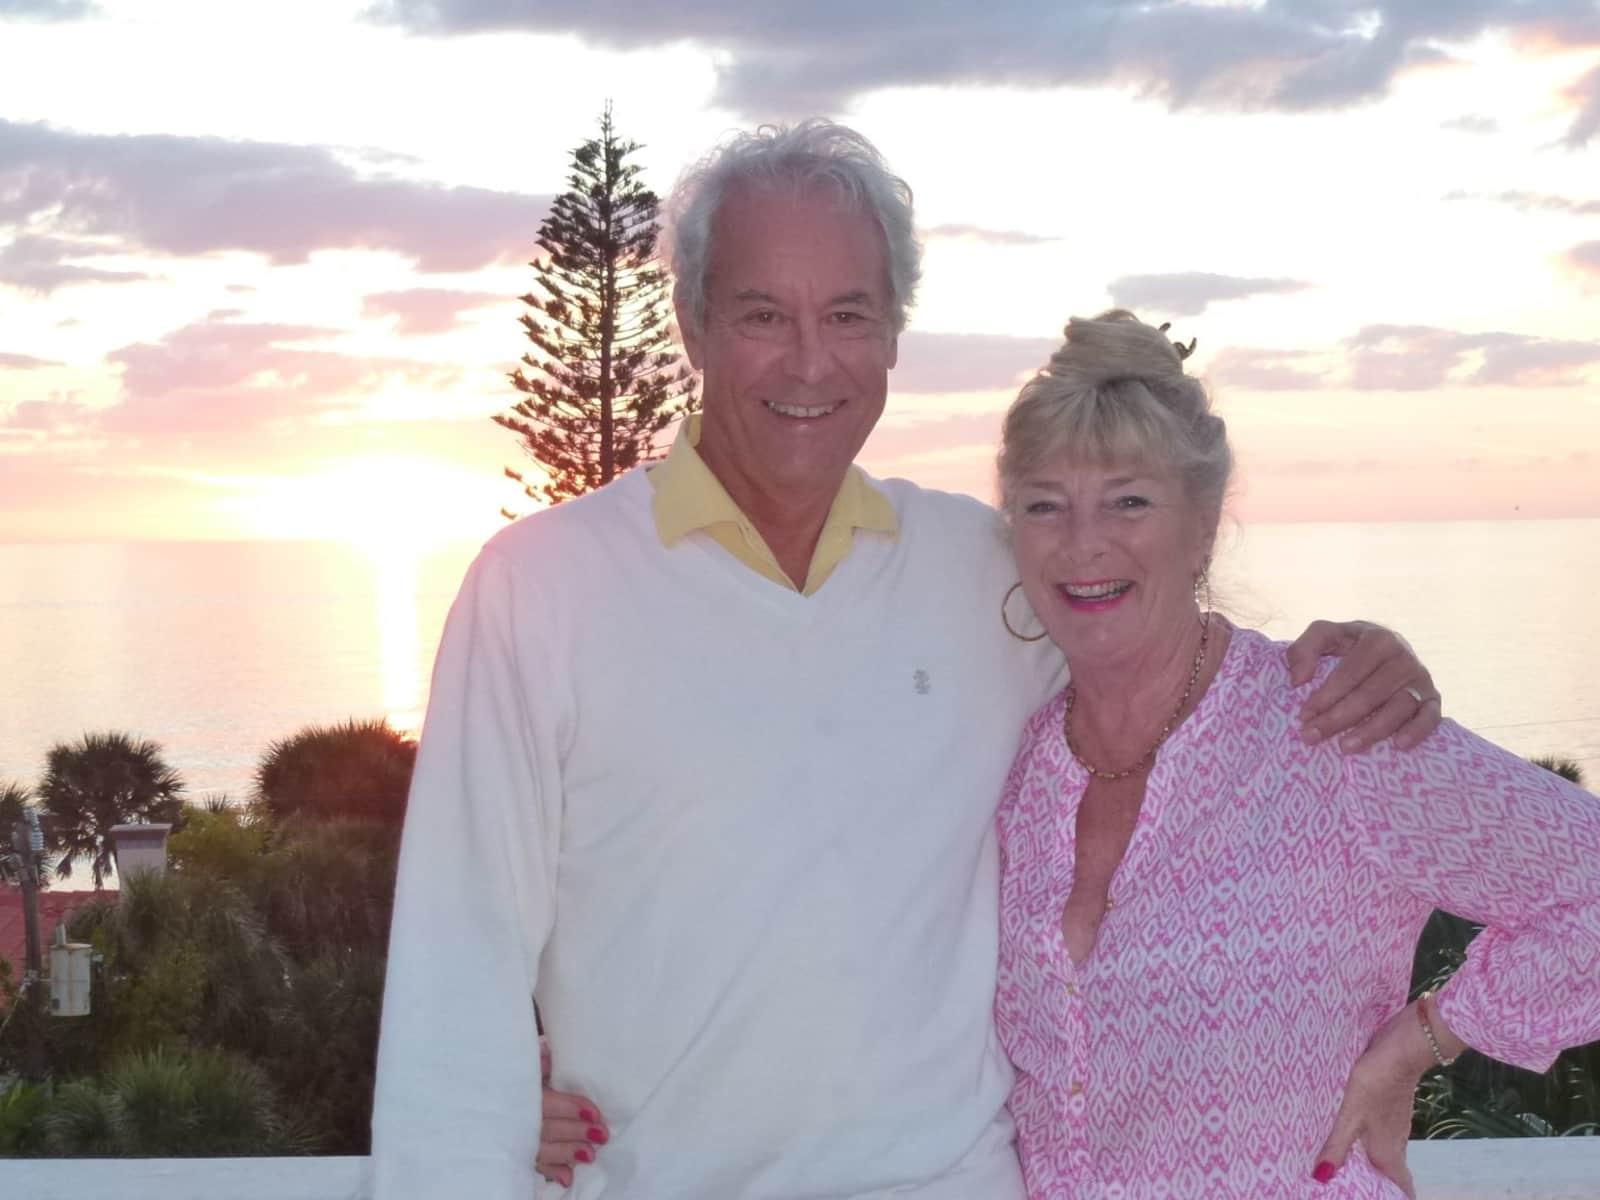 Pamela & Robert from Plévenon, France